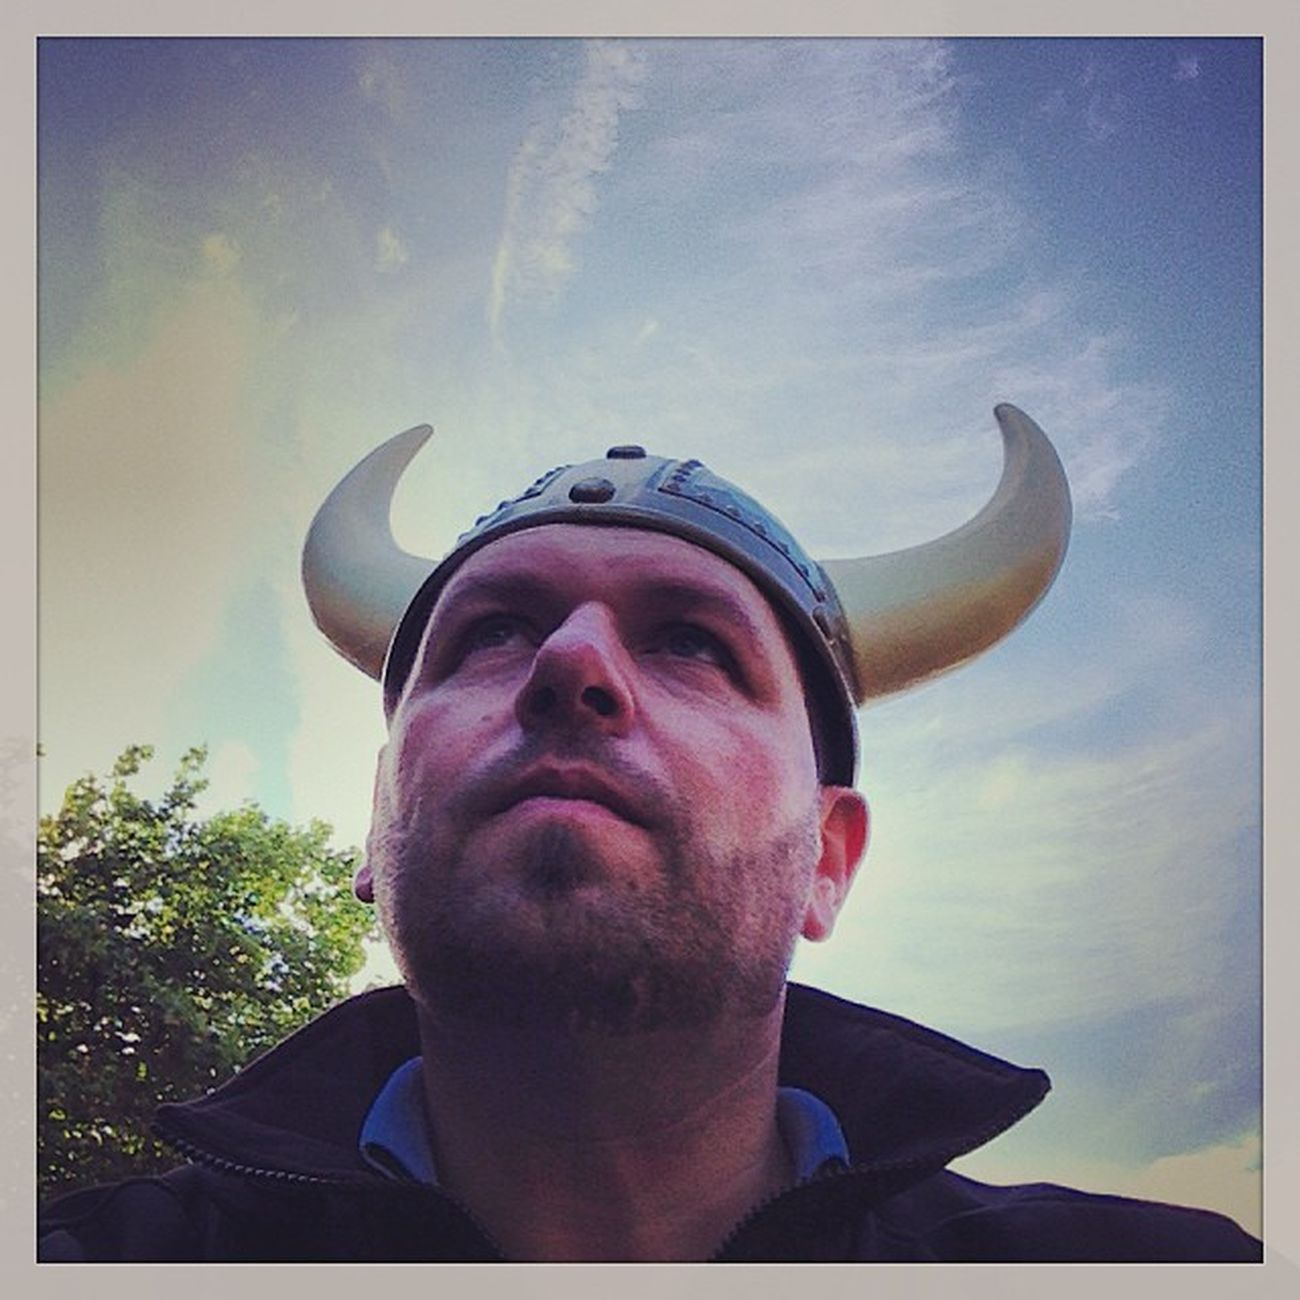 It's a Viking! o/ #tbex Hoomygumb Travelblog Me Travelblogger Lovedublin Tbex Sightseeing Vikingsplash Selfie Travel Dublin Instaprofile Helmet Myself Tour Reisen Selfpic Viking Jayfkay